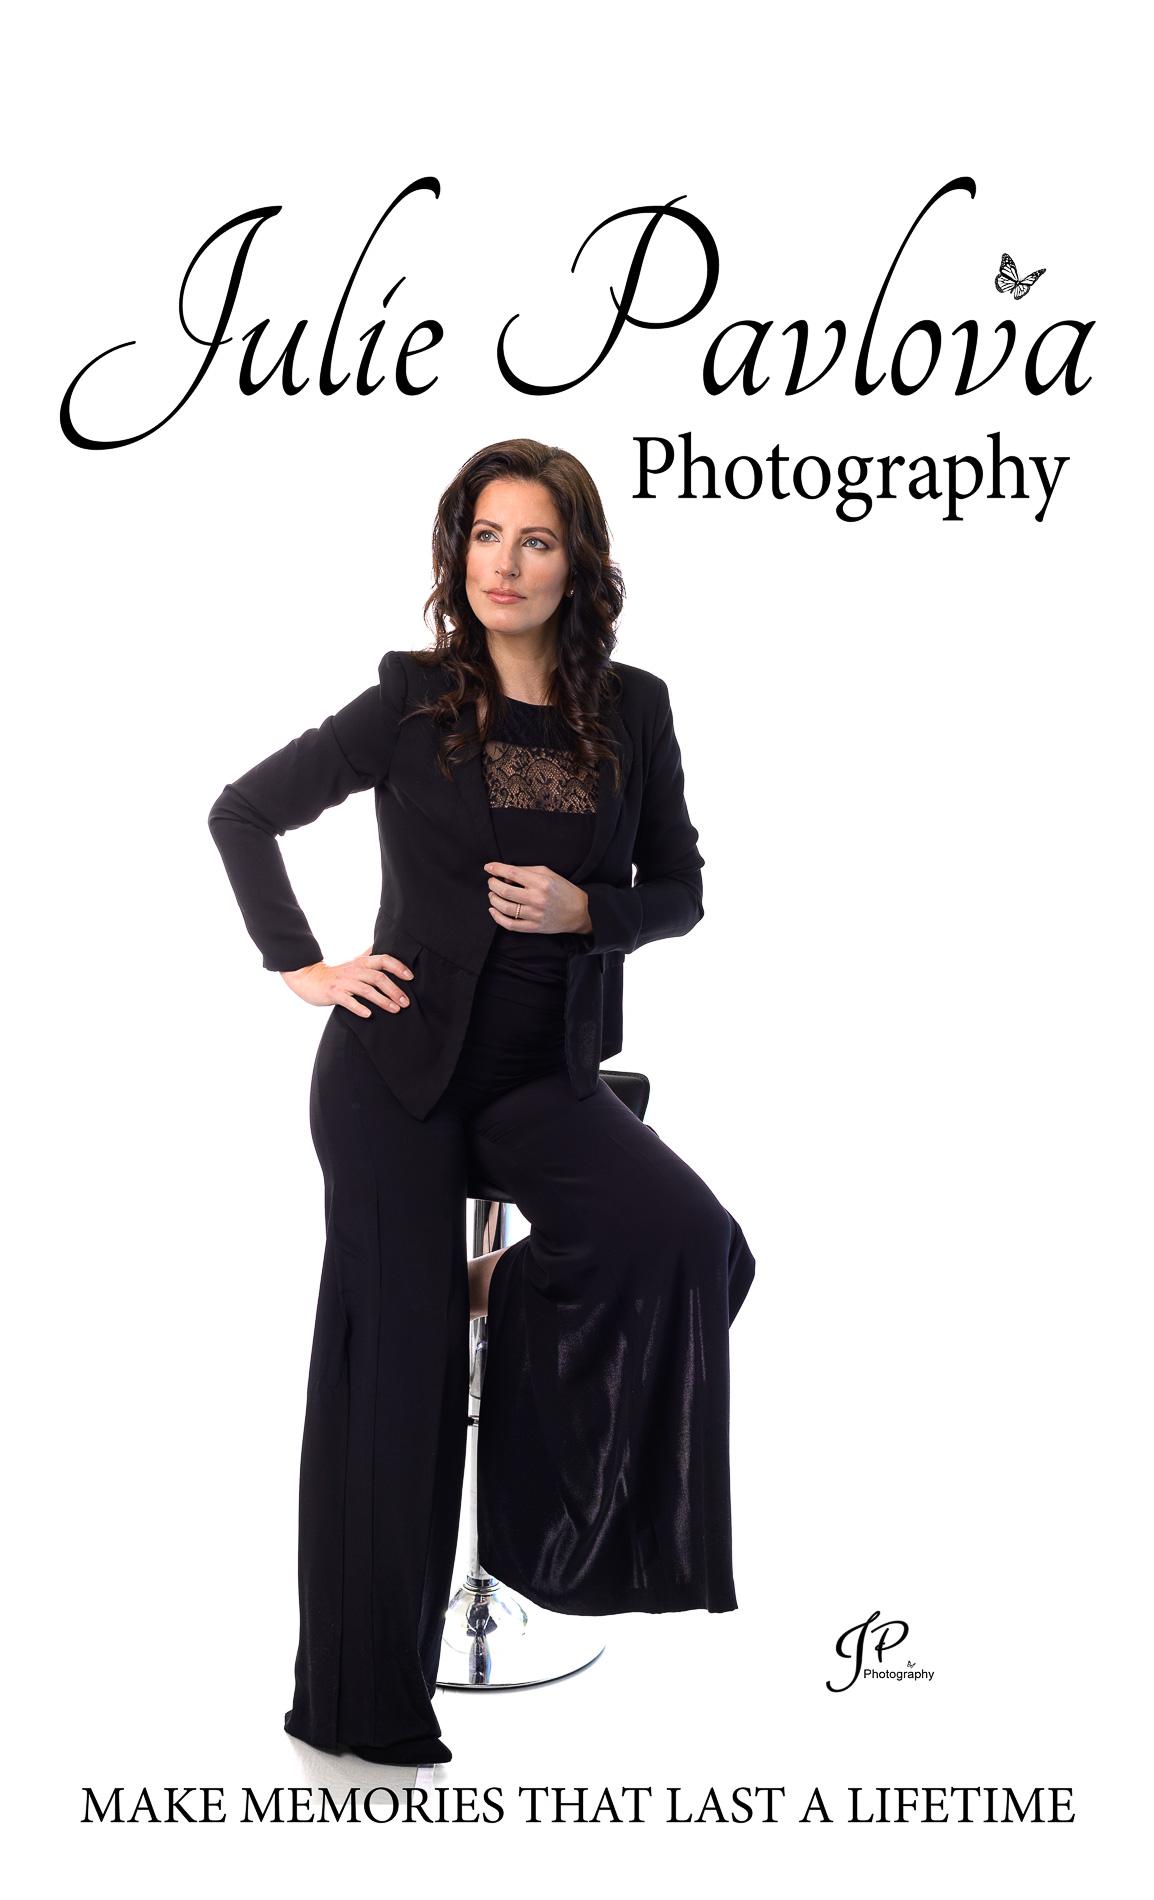 Fine Art Personal Branding Portrait by New Jersey professional photographer Julie Pavlova Photography, top 20 Best New York Photographers (Bergen County, NJ)